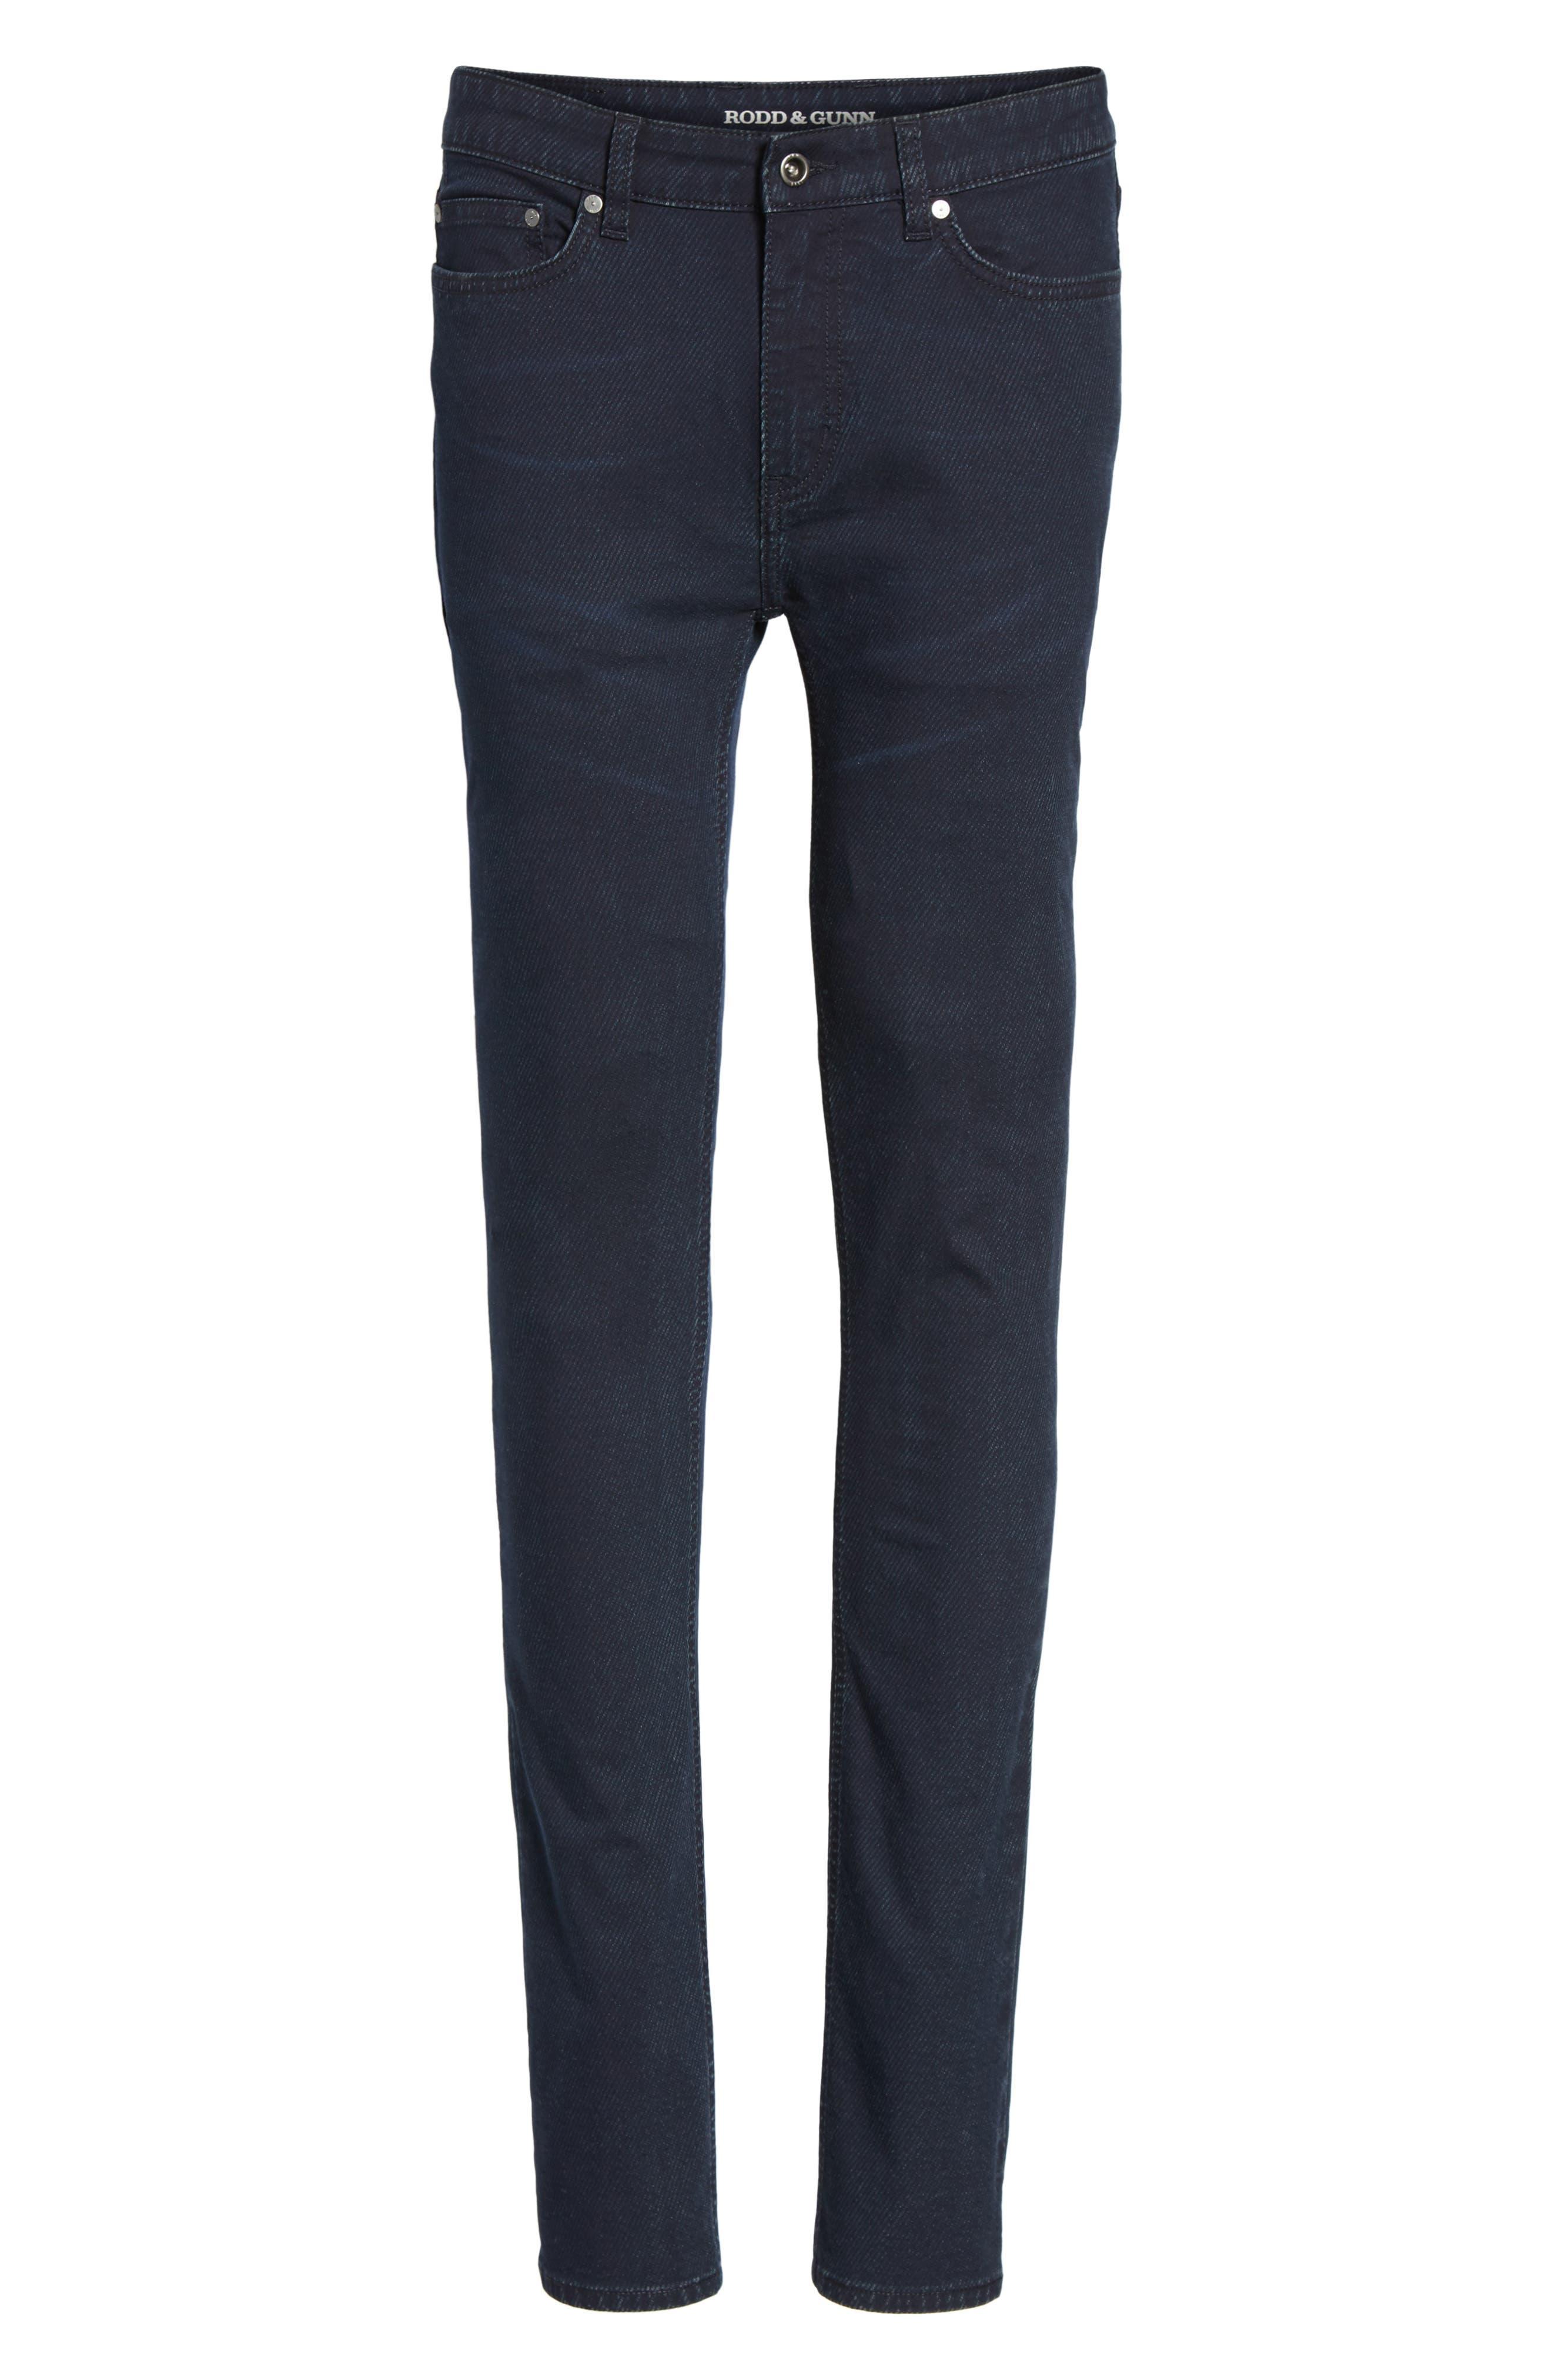 Palmwood Slim Fit Jeans,                             Alternate thumbnail 6, color,                             411